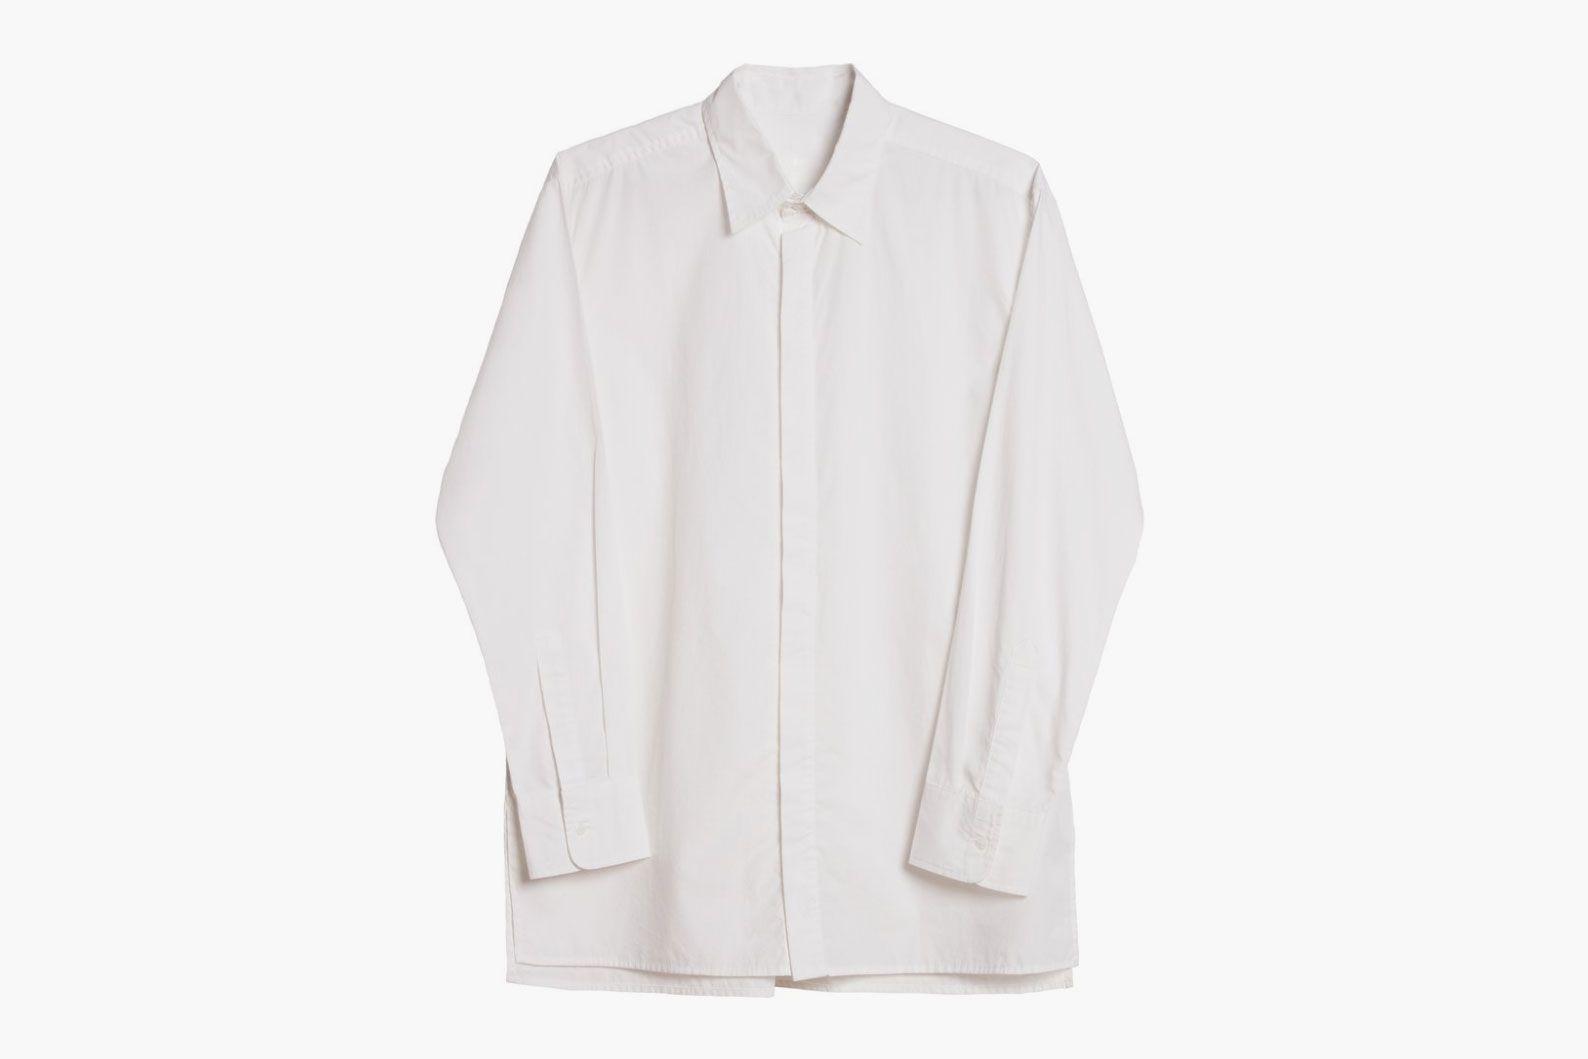 Dockers x Karla Long Sleeve Woven Shirt